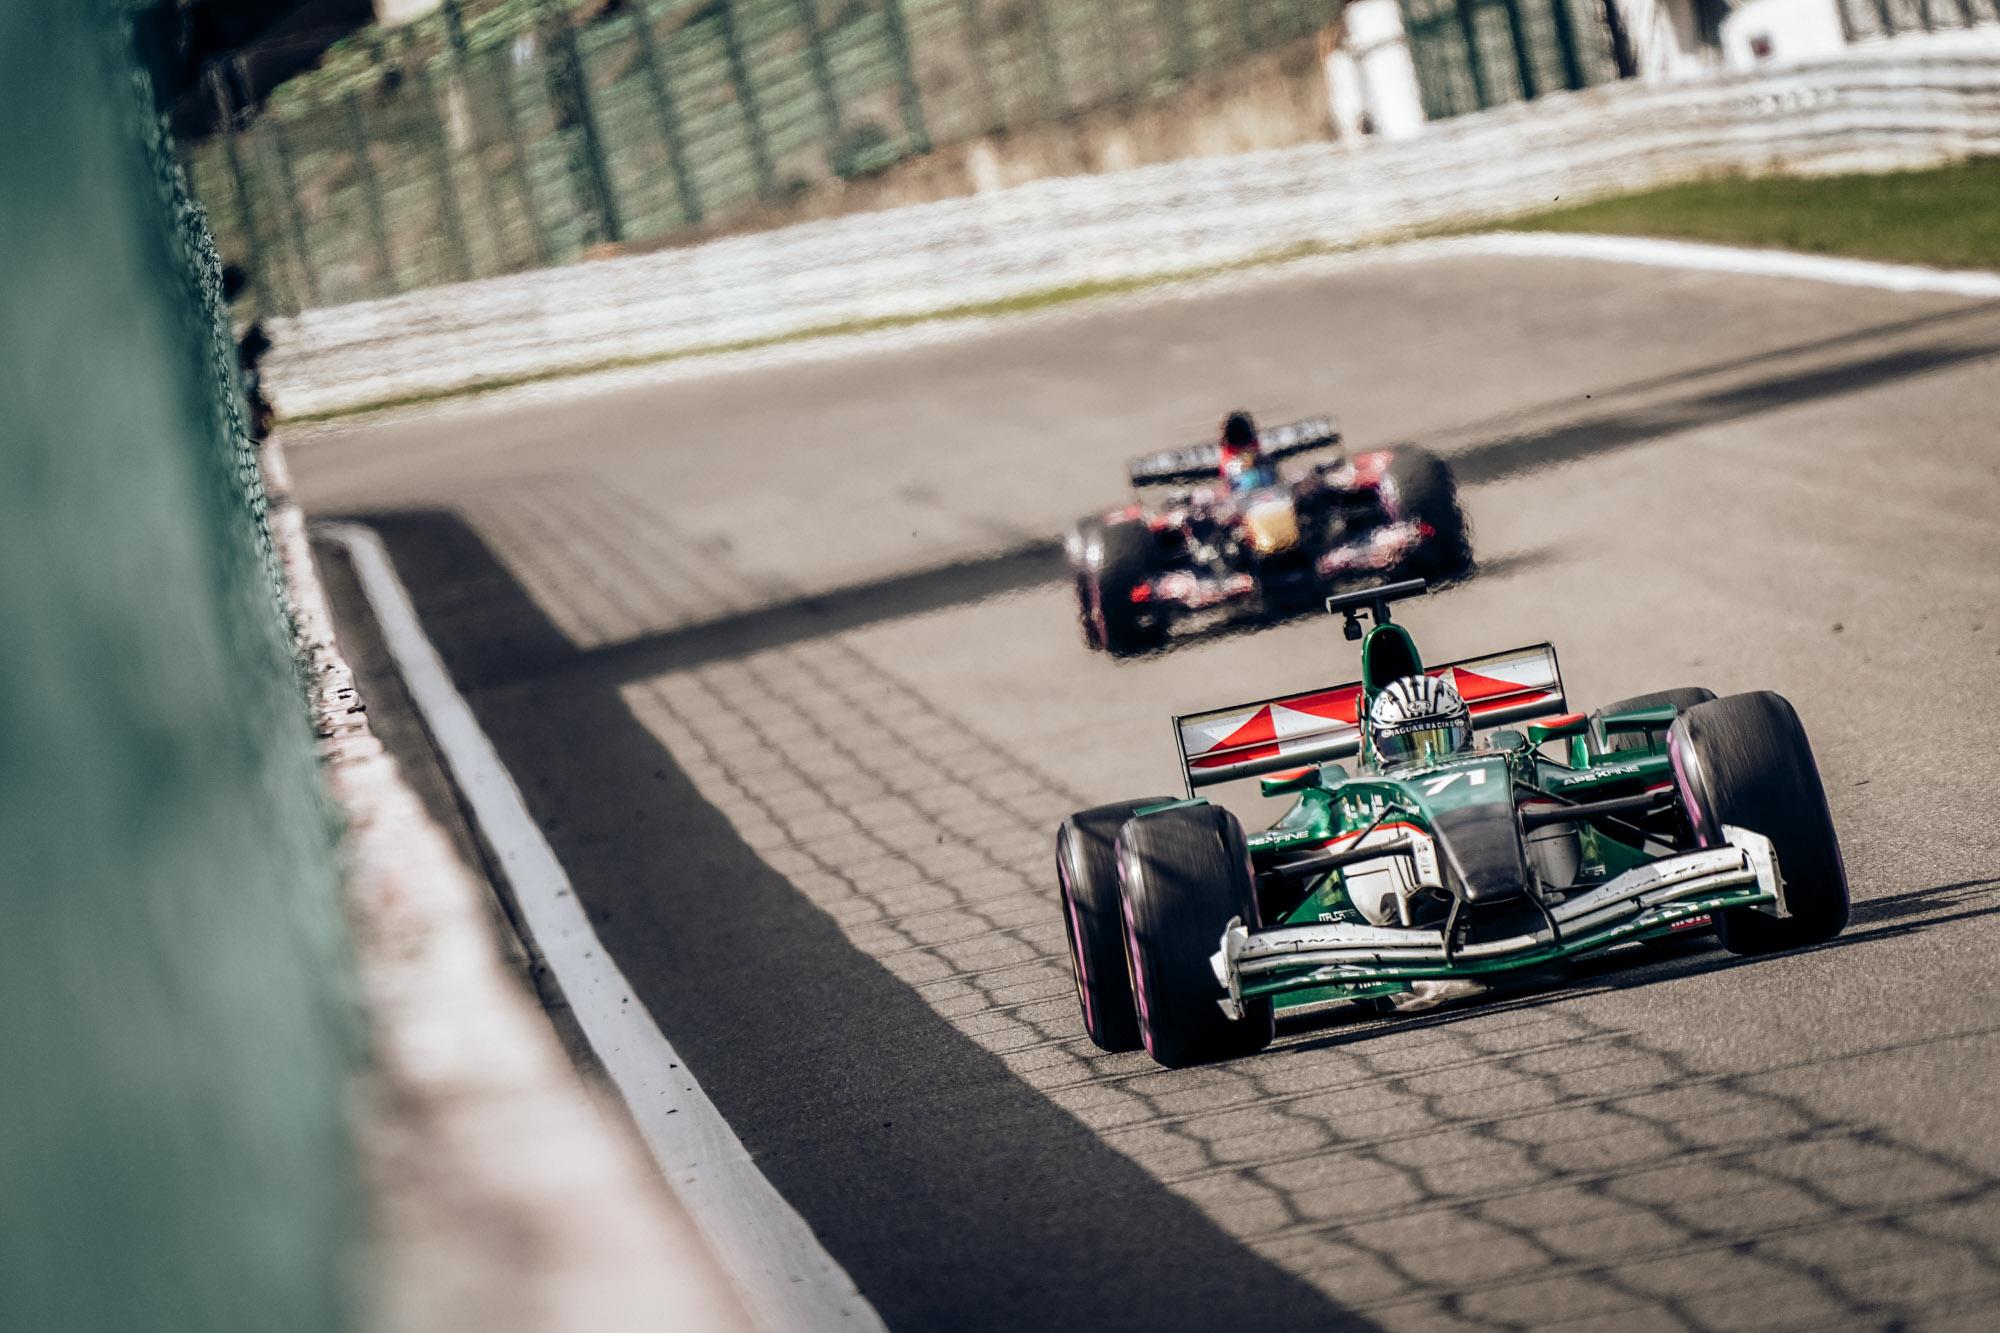 Ingo Gerstl is chasing Riccardo Ponzio for the lead